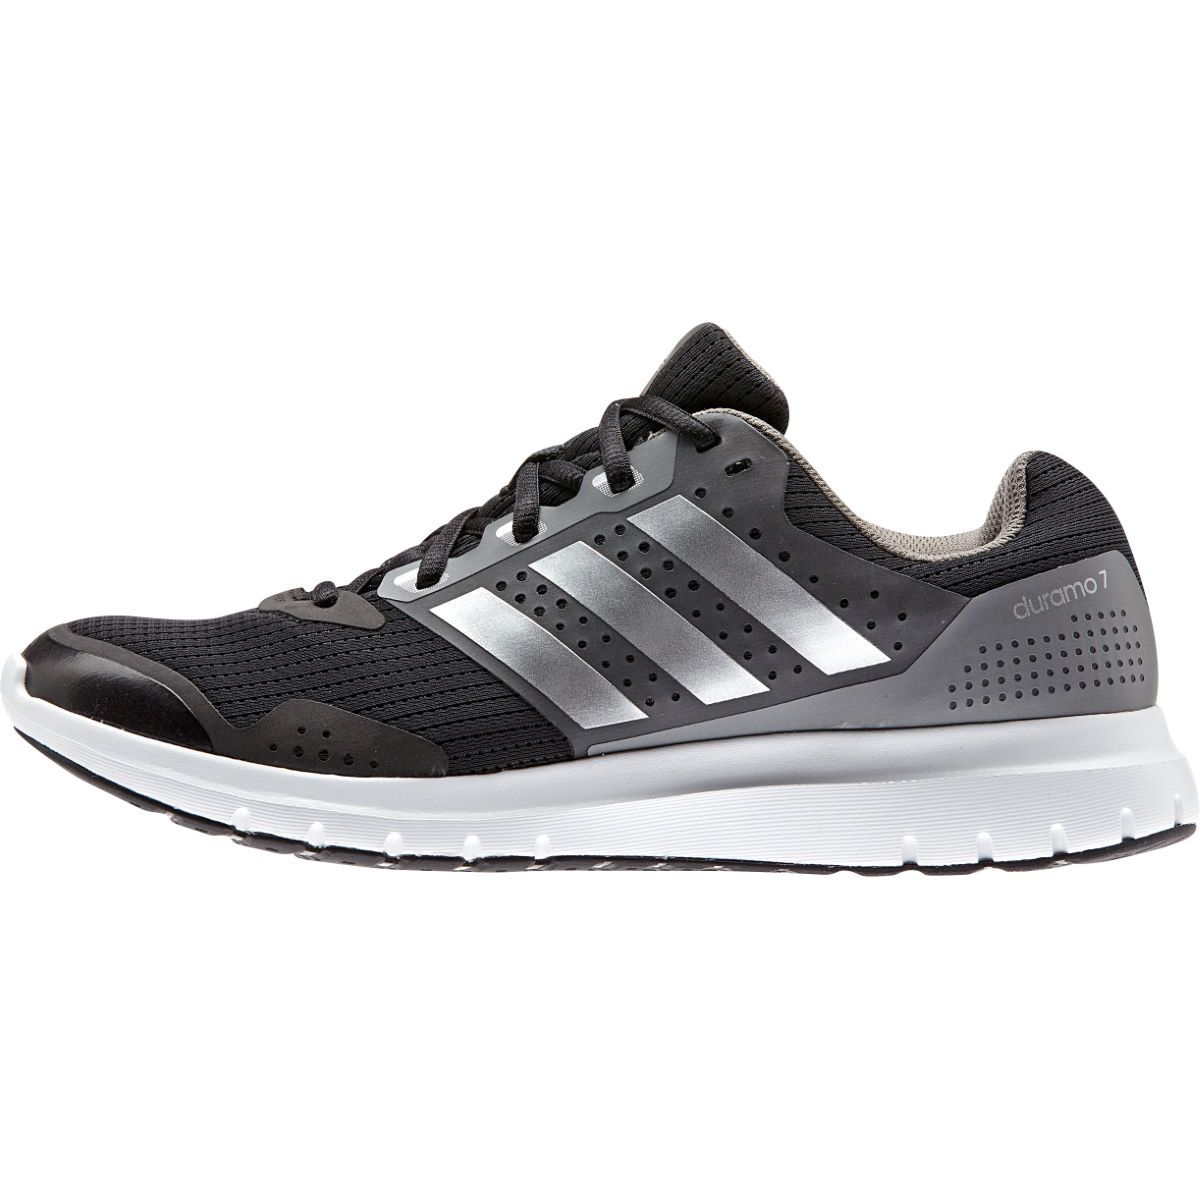 pretty nice e950b 8491c Adidas Duramo 7 Shoes (AW15) Training Running Shoes